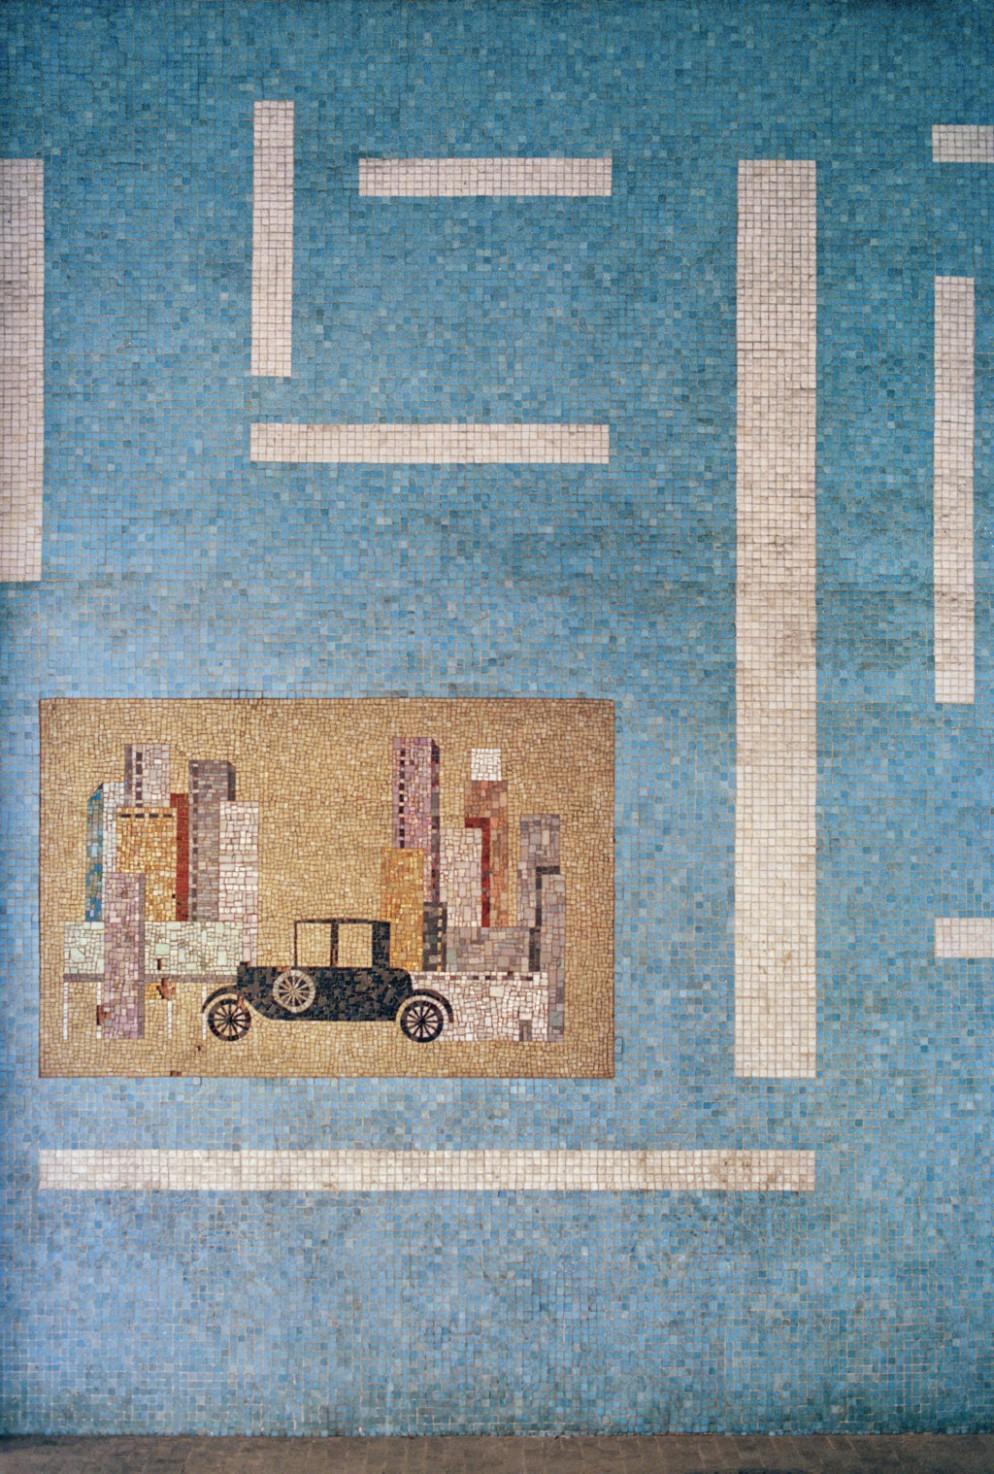 milano-architettura-023 -ph_stefan-giftthaler-livingcorriere